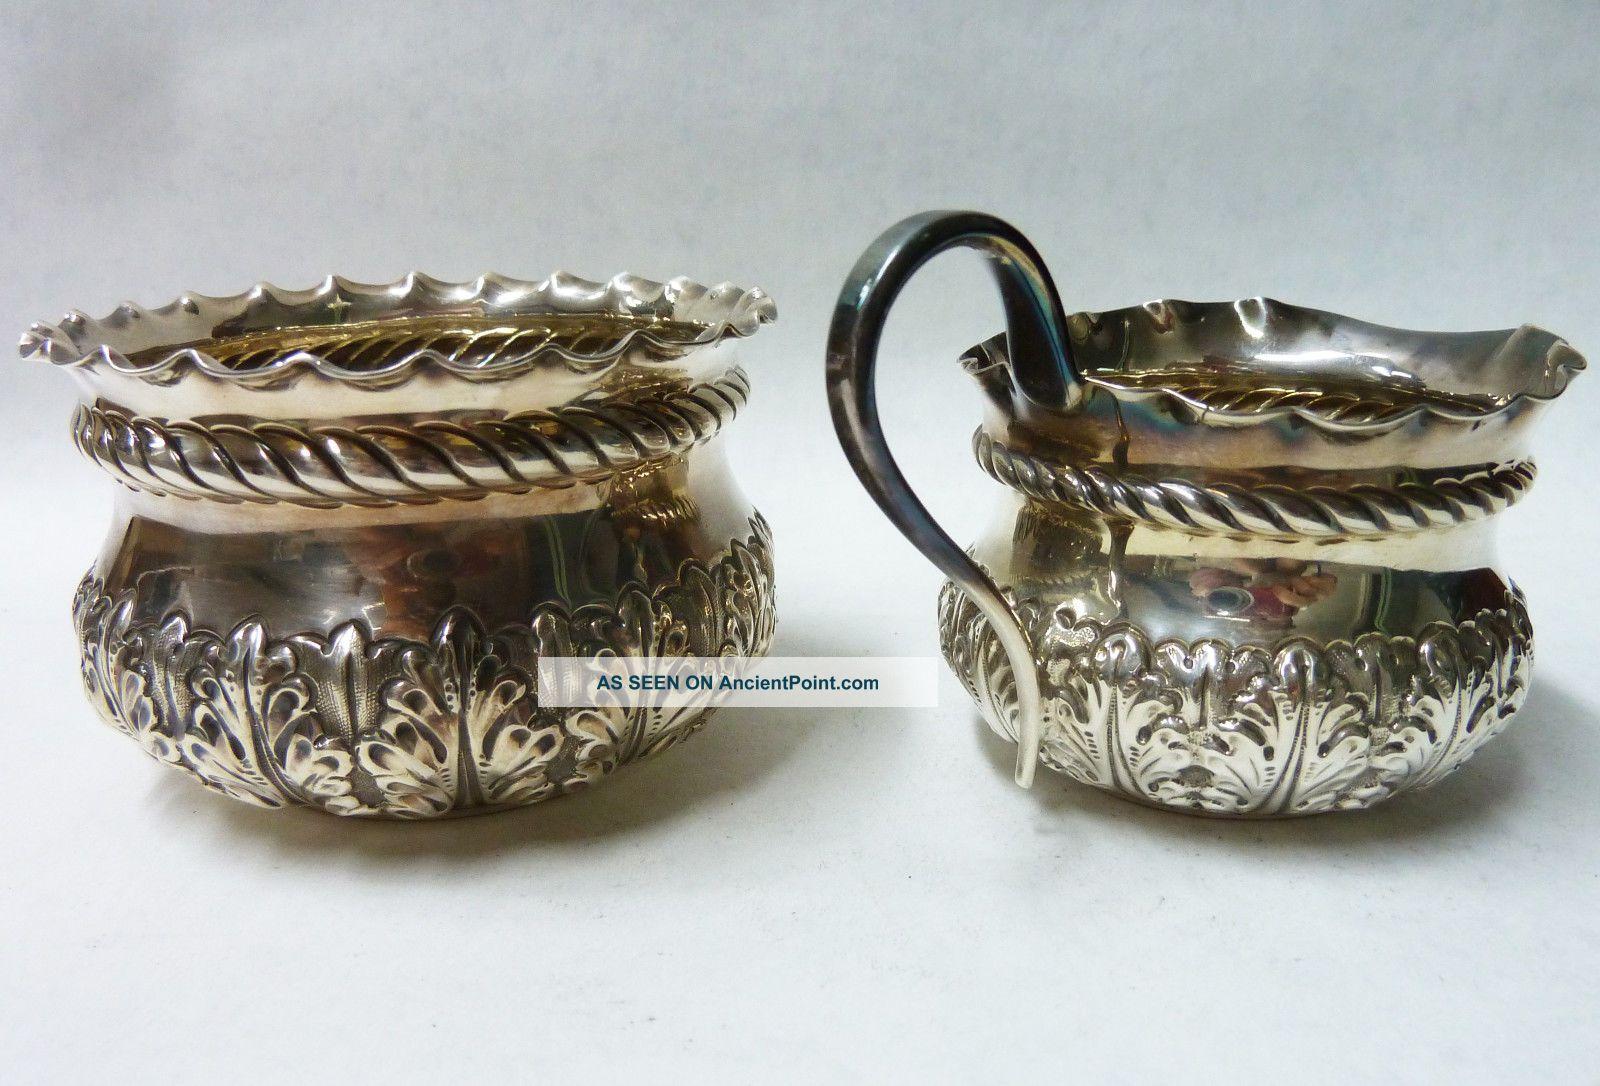 Matching Antique Solid Silver Sugar Bowl London 1896 & Cream Jug 1895 - 131g Tea/Coffee Pots & Sets photo